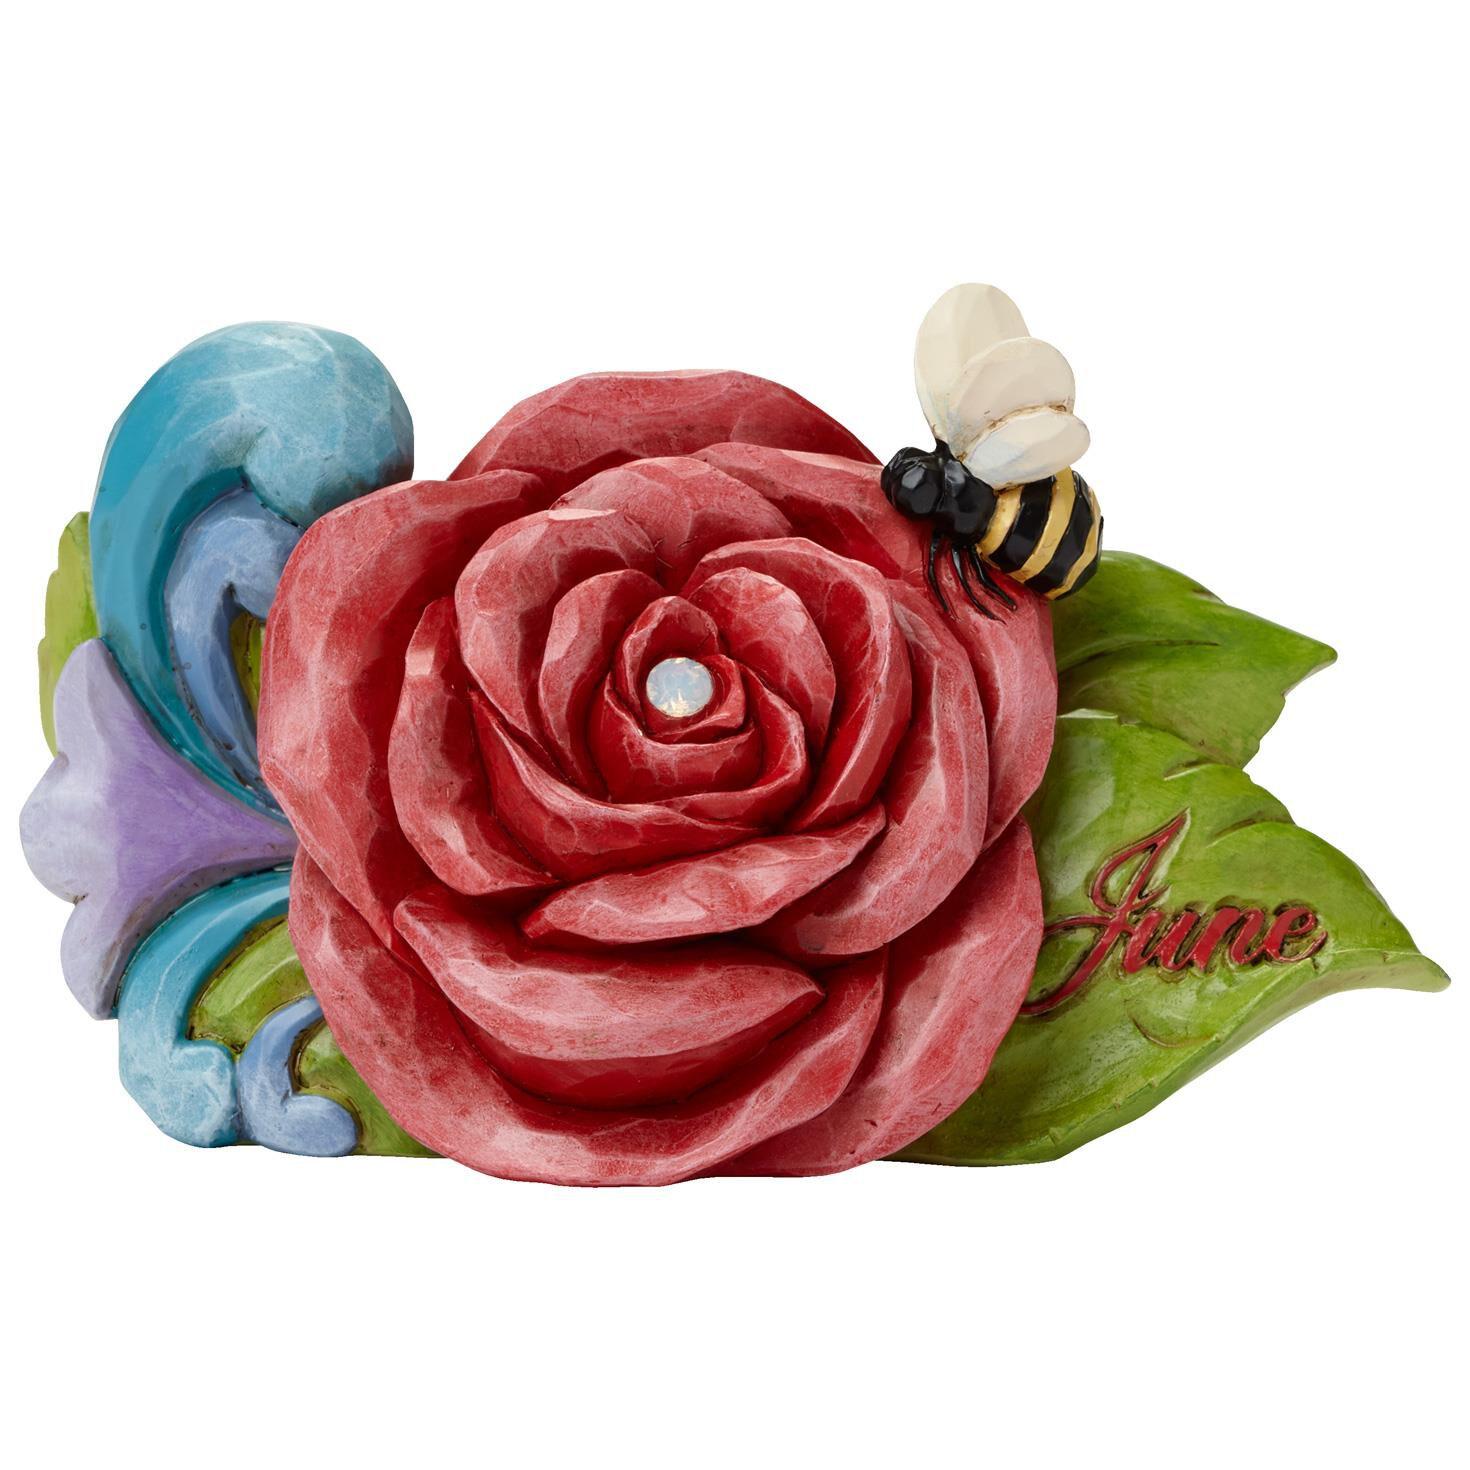 Jim Shore June Alexandrite Birthstone and Rose Flower Figurine Figurines